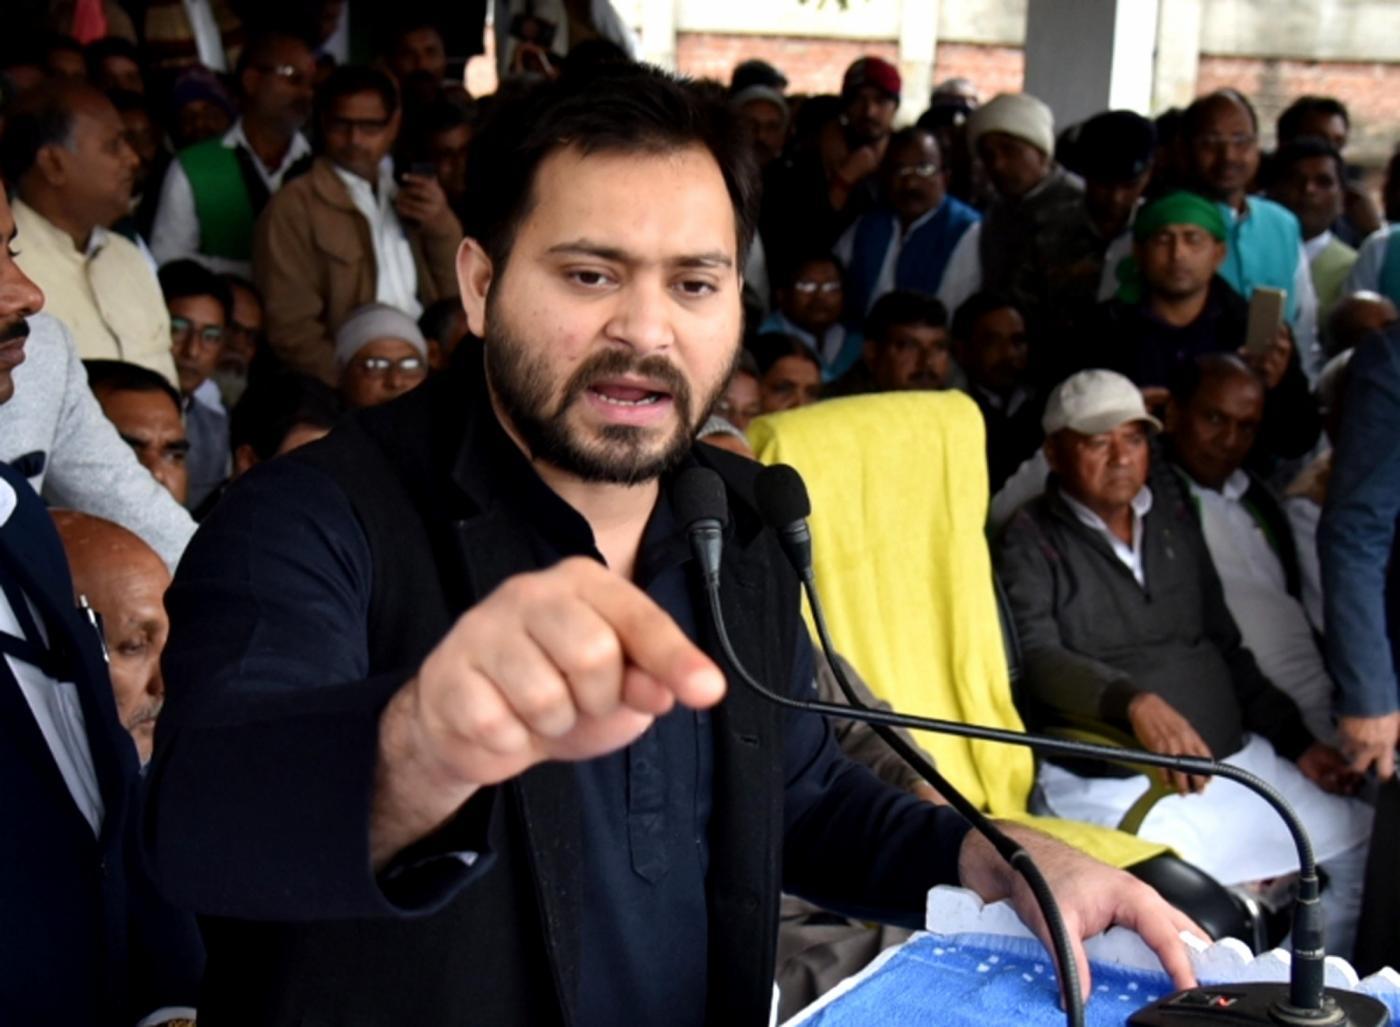 Saupul: RJD leader Tejashwi Yadav addresses a public rally in Bihar's Supaul on Feb 8, 2019. (Photo: IANS) by .